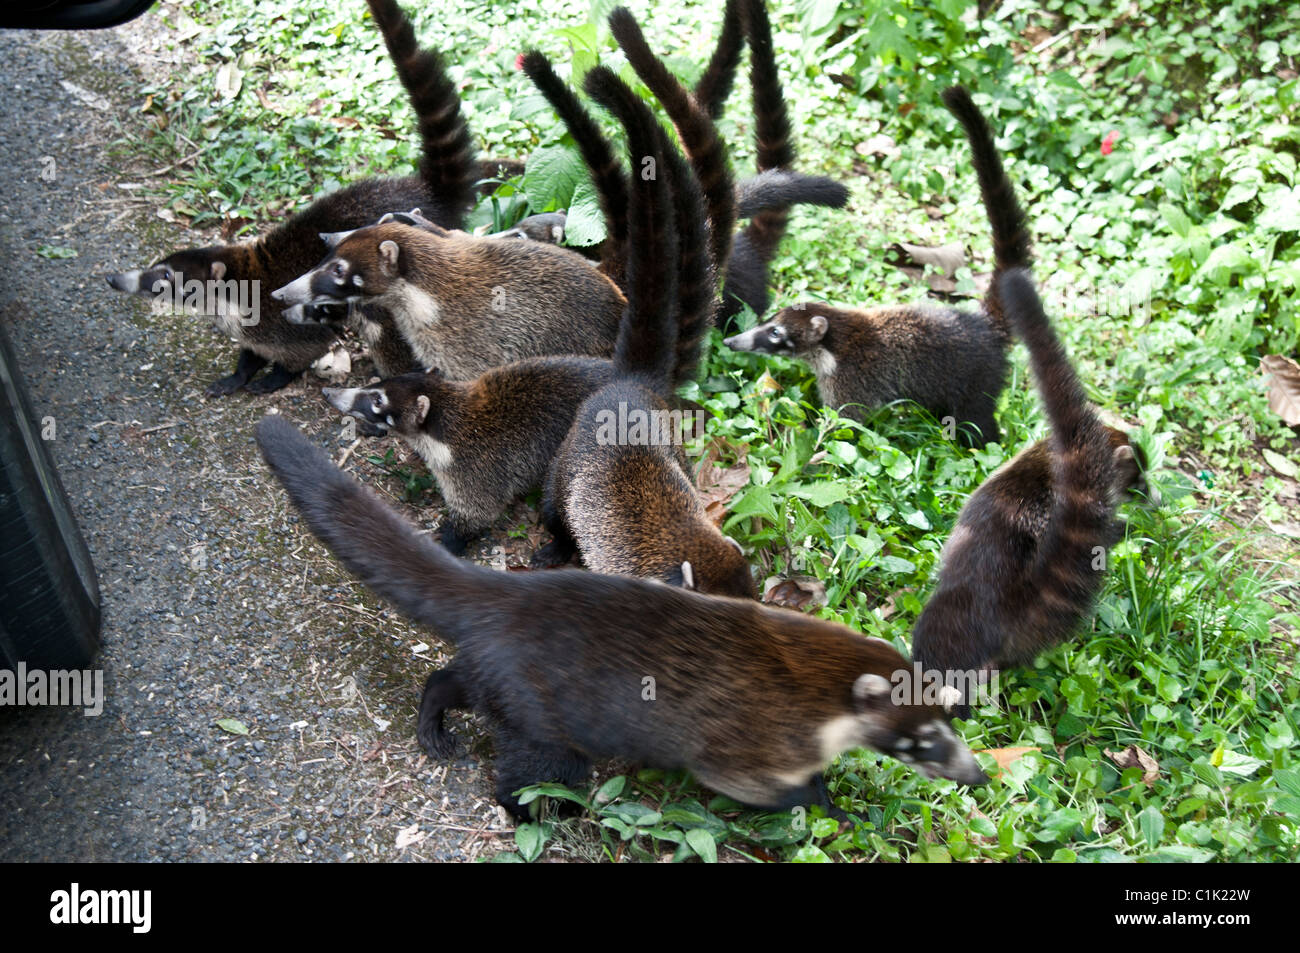 Coatis ,Pizote,Brazilian Aardvark - Stock Image